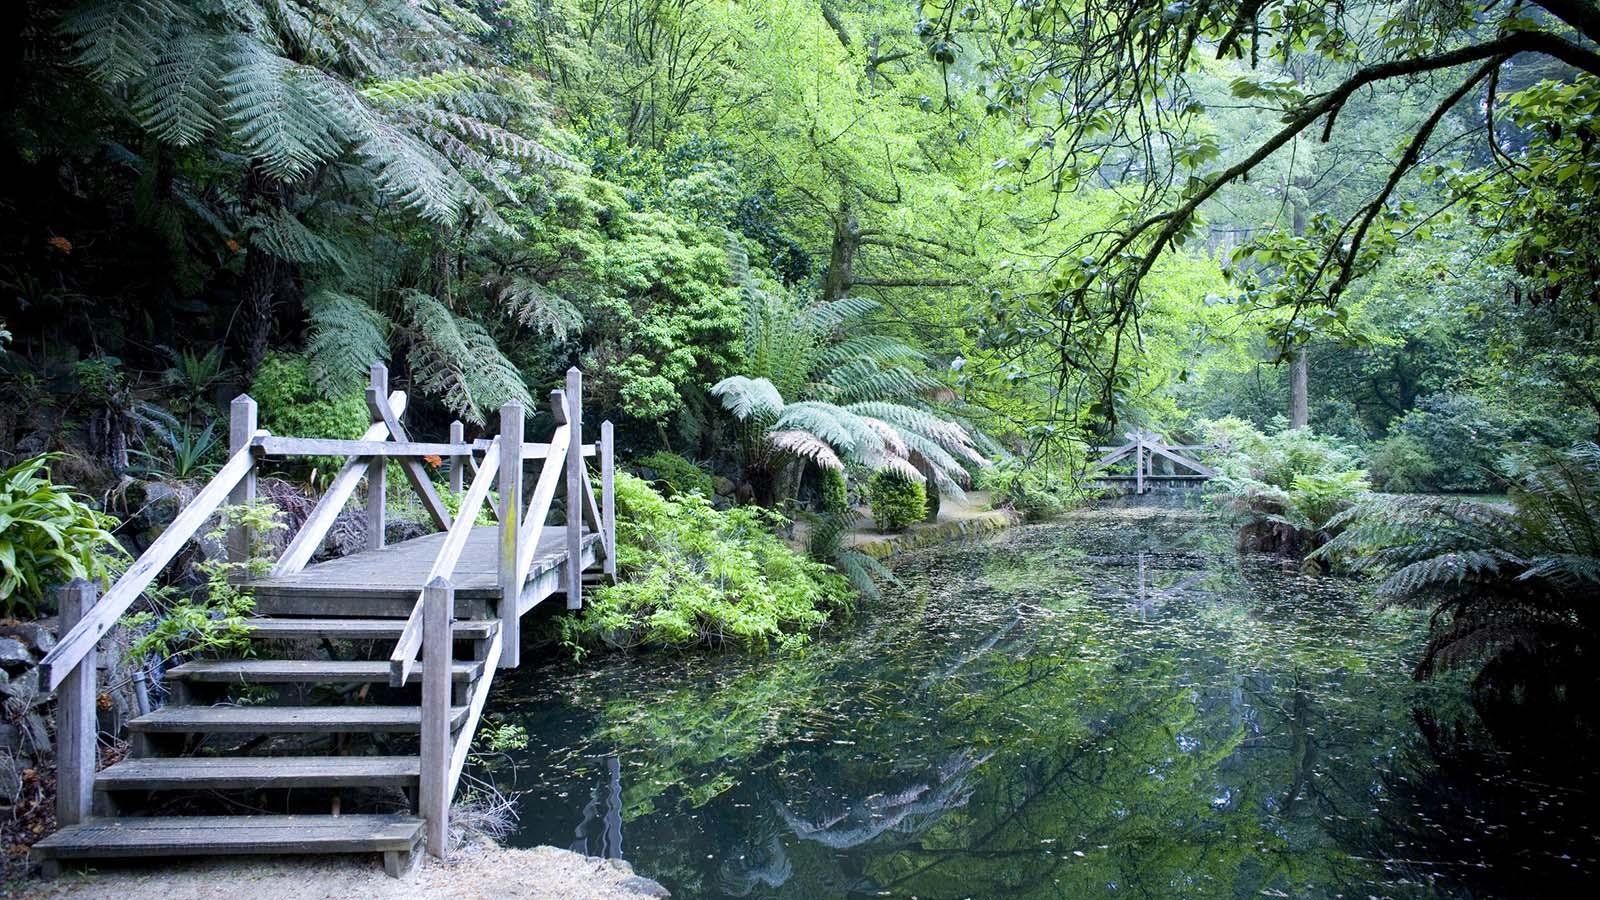 Alfred Nicholas Gardens, Sherbrooke, Yarra Valley and Dandenong Ranges, Victoria, Australia